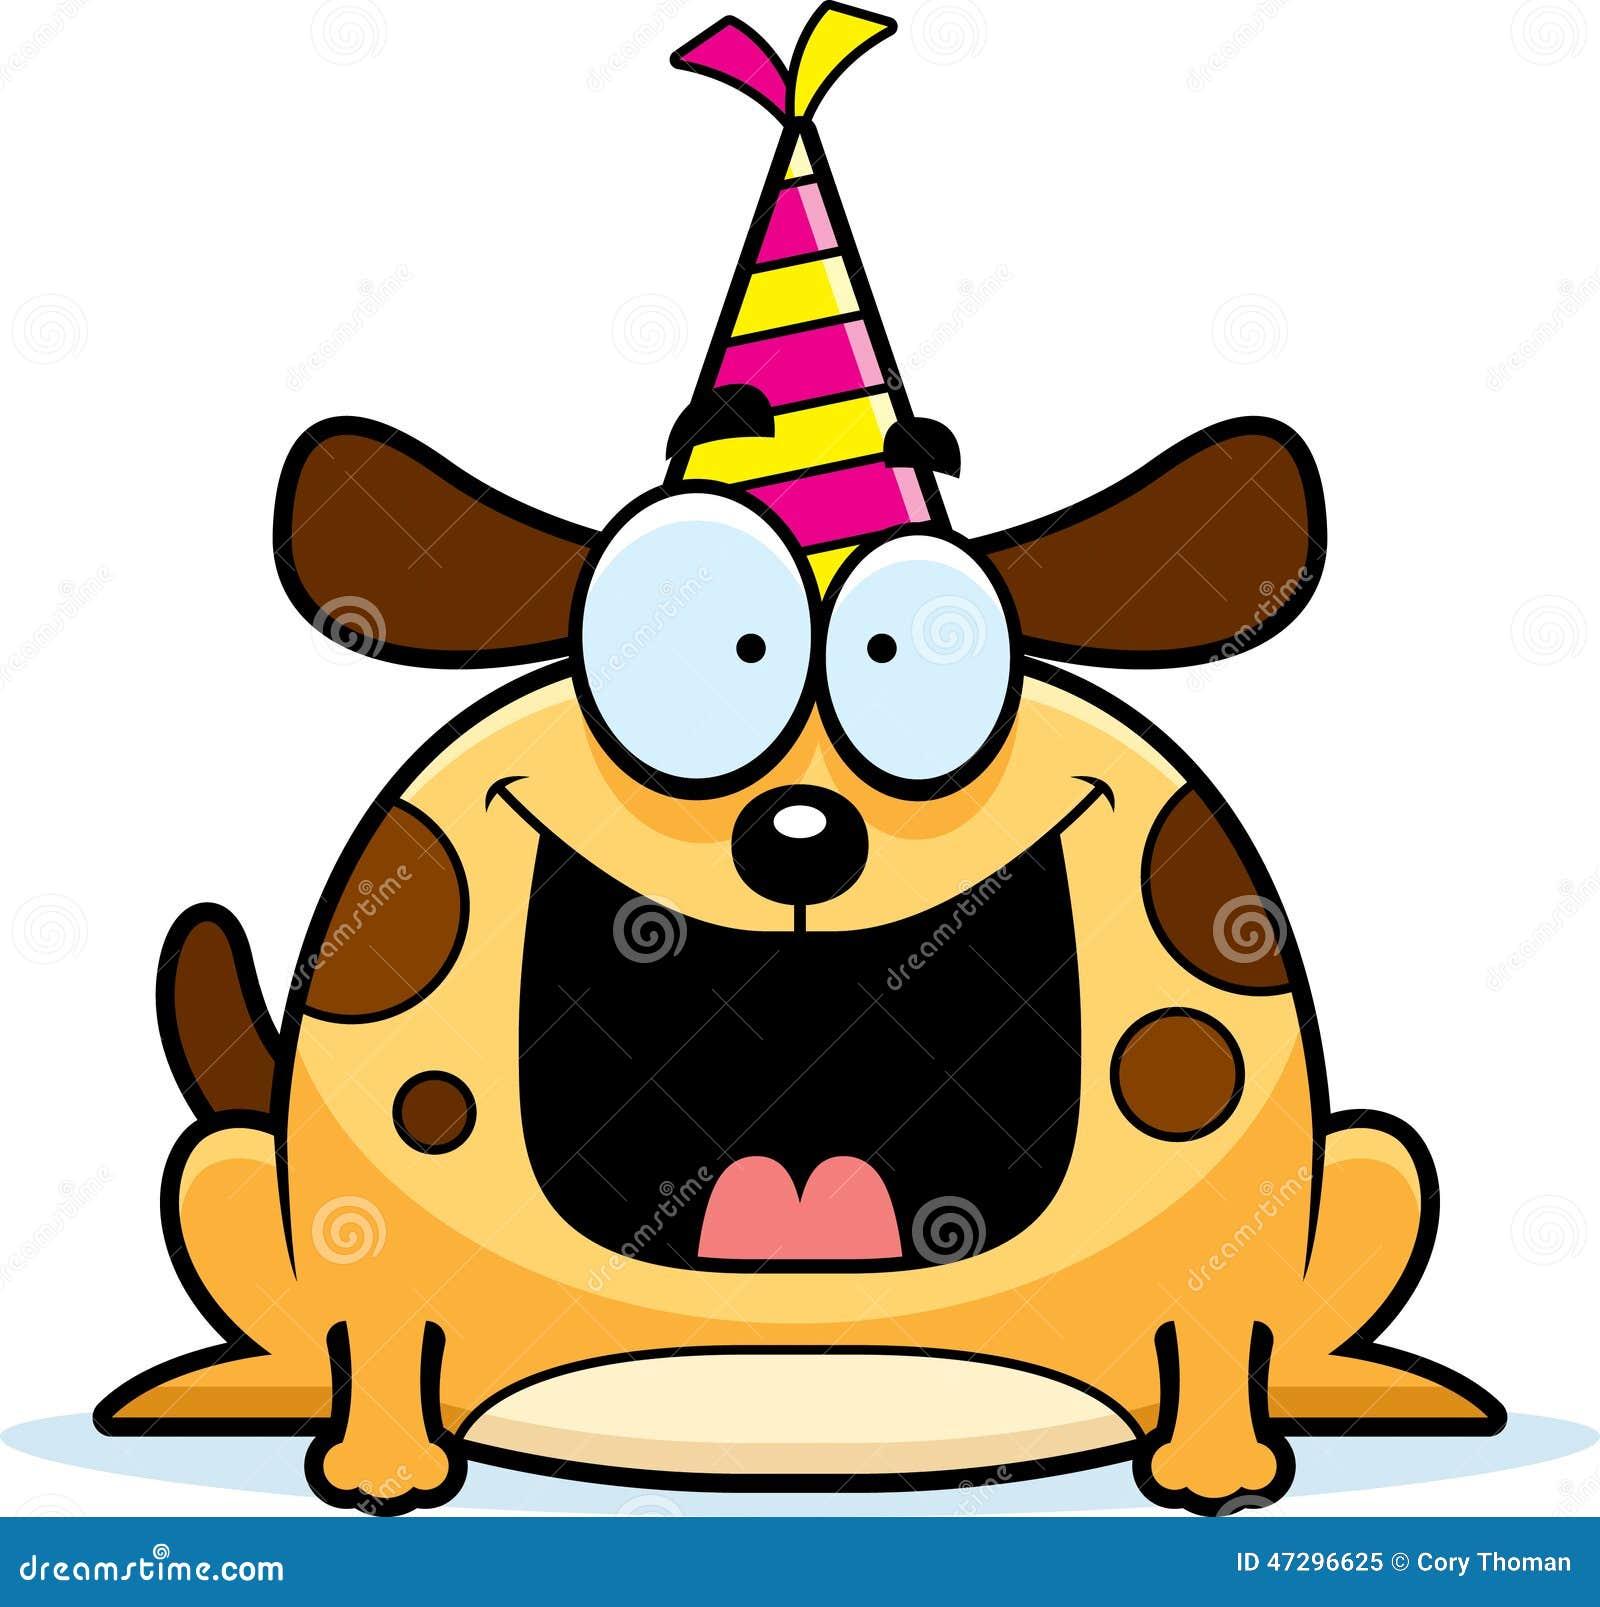 Dog Birthday Party Invitation was perfect invitations example